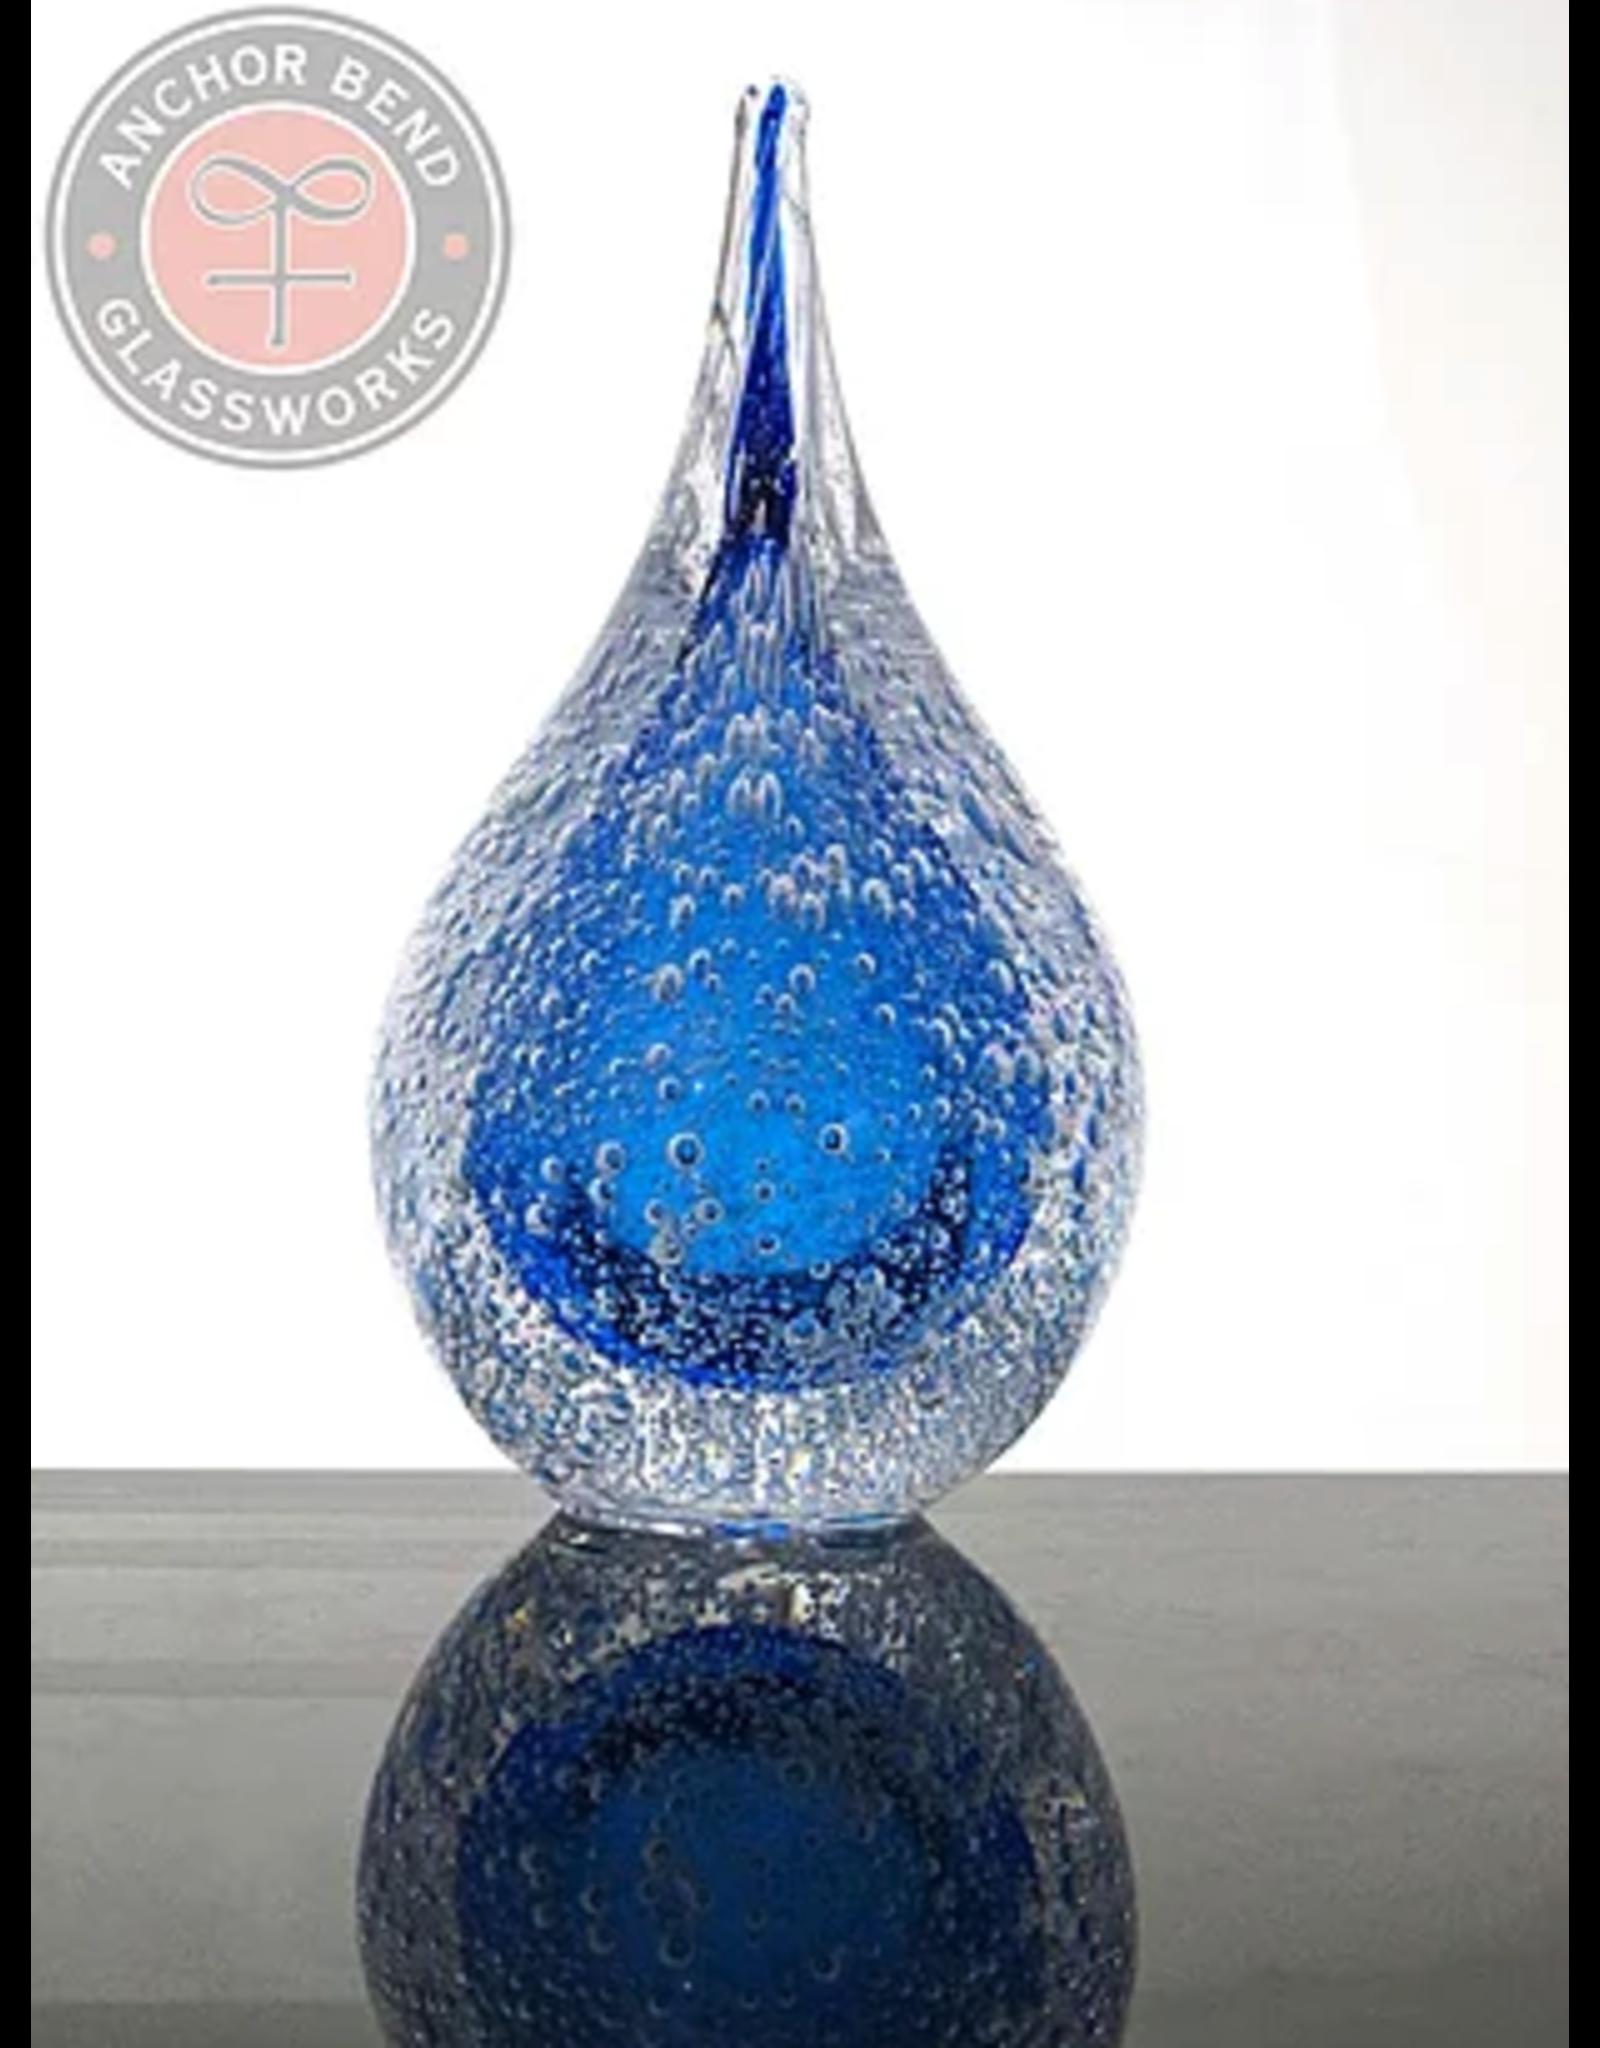 Anchor Bend Water Drop w/Bubbles Sculpture (ANCB)